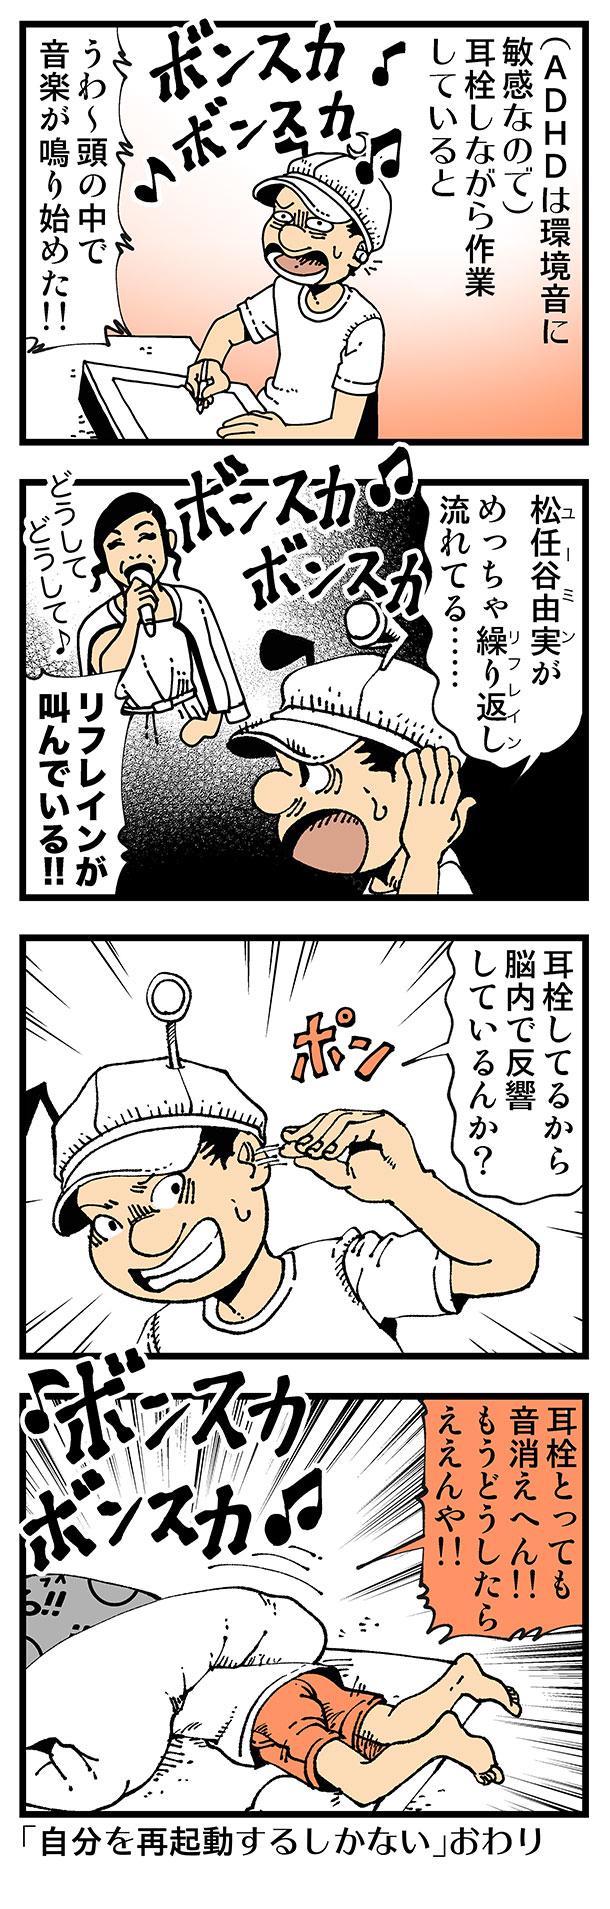 【普通】earworm!!